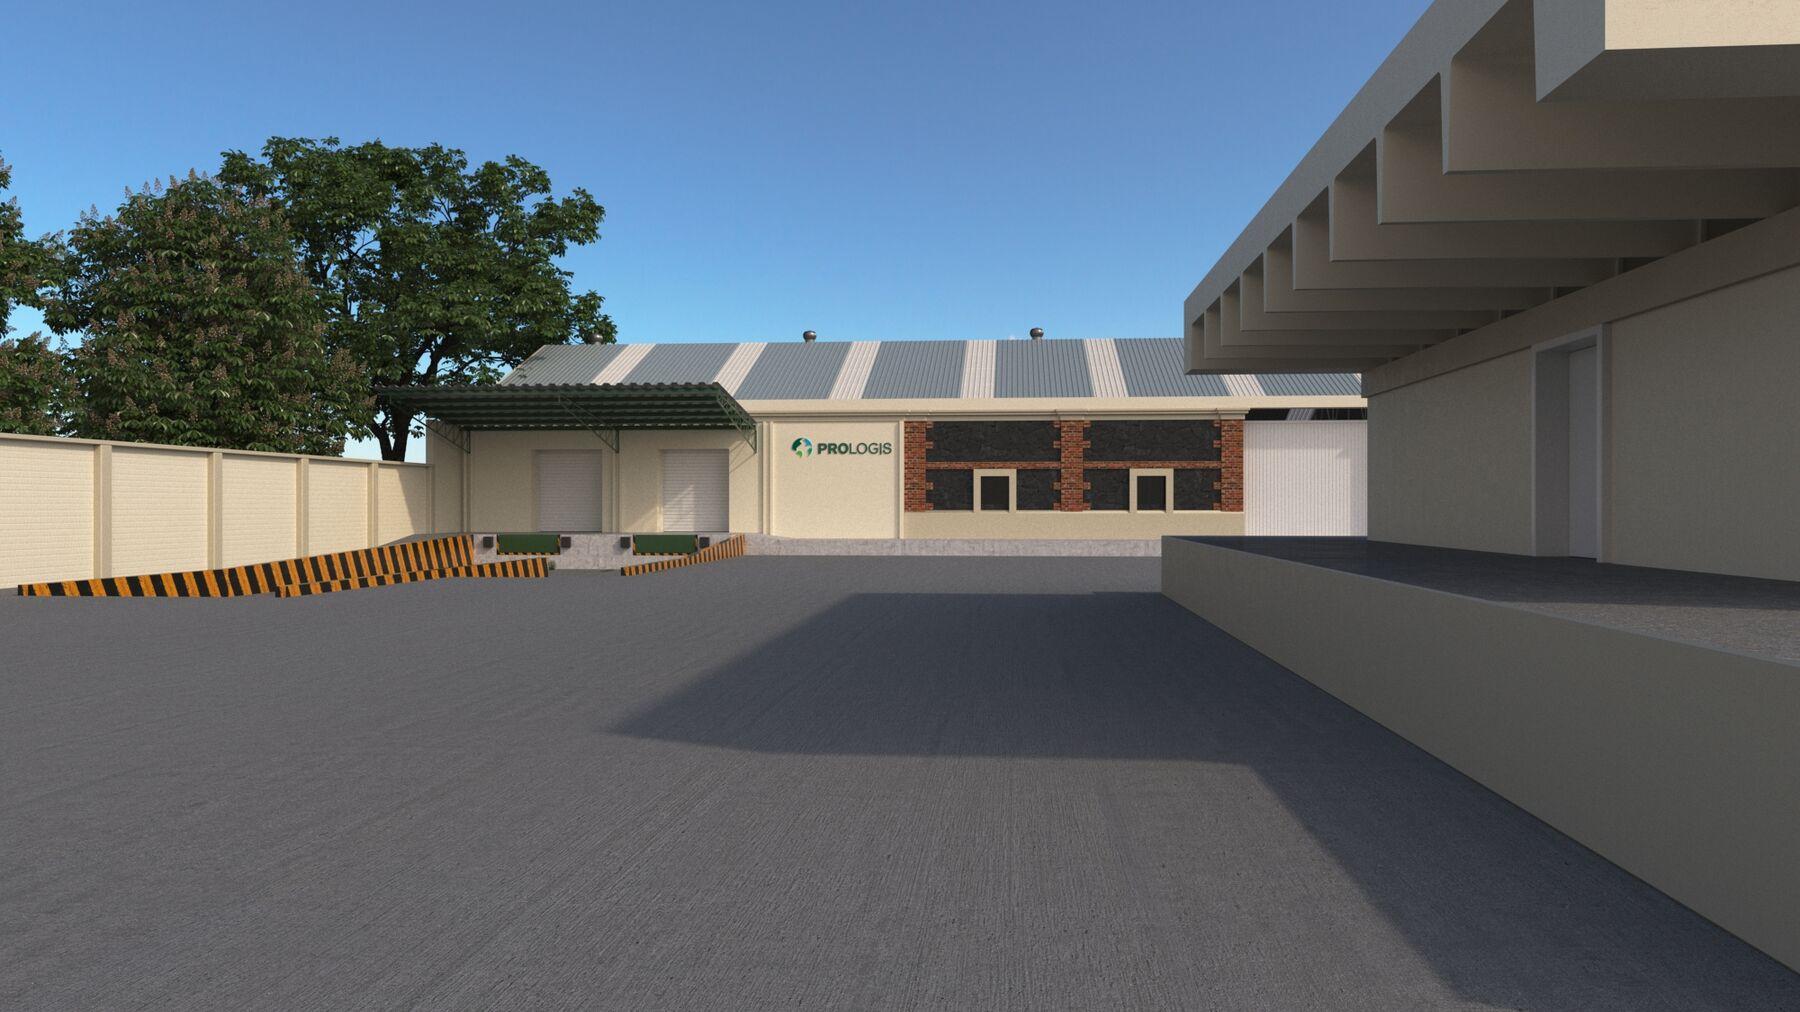 DPM-Santa-Maria-1-rendering.jpg